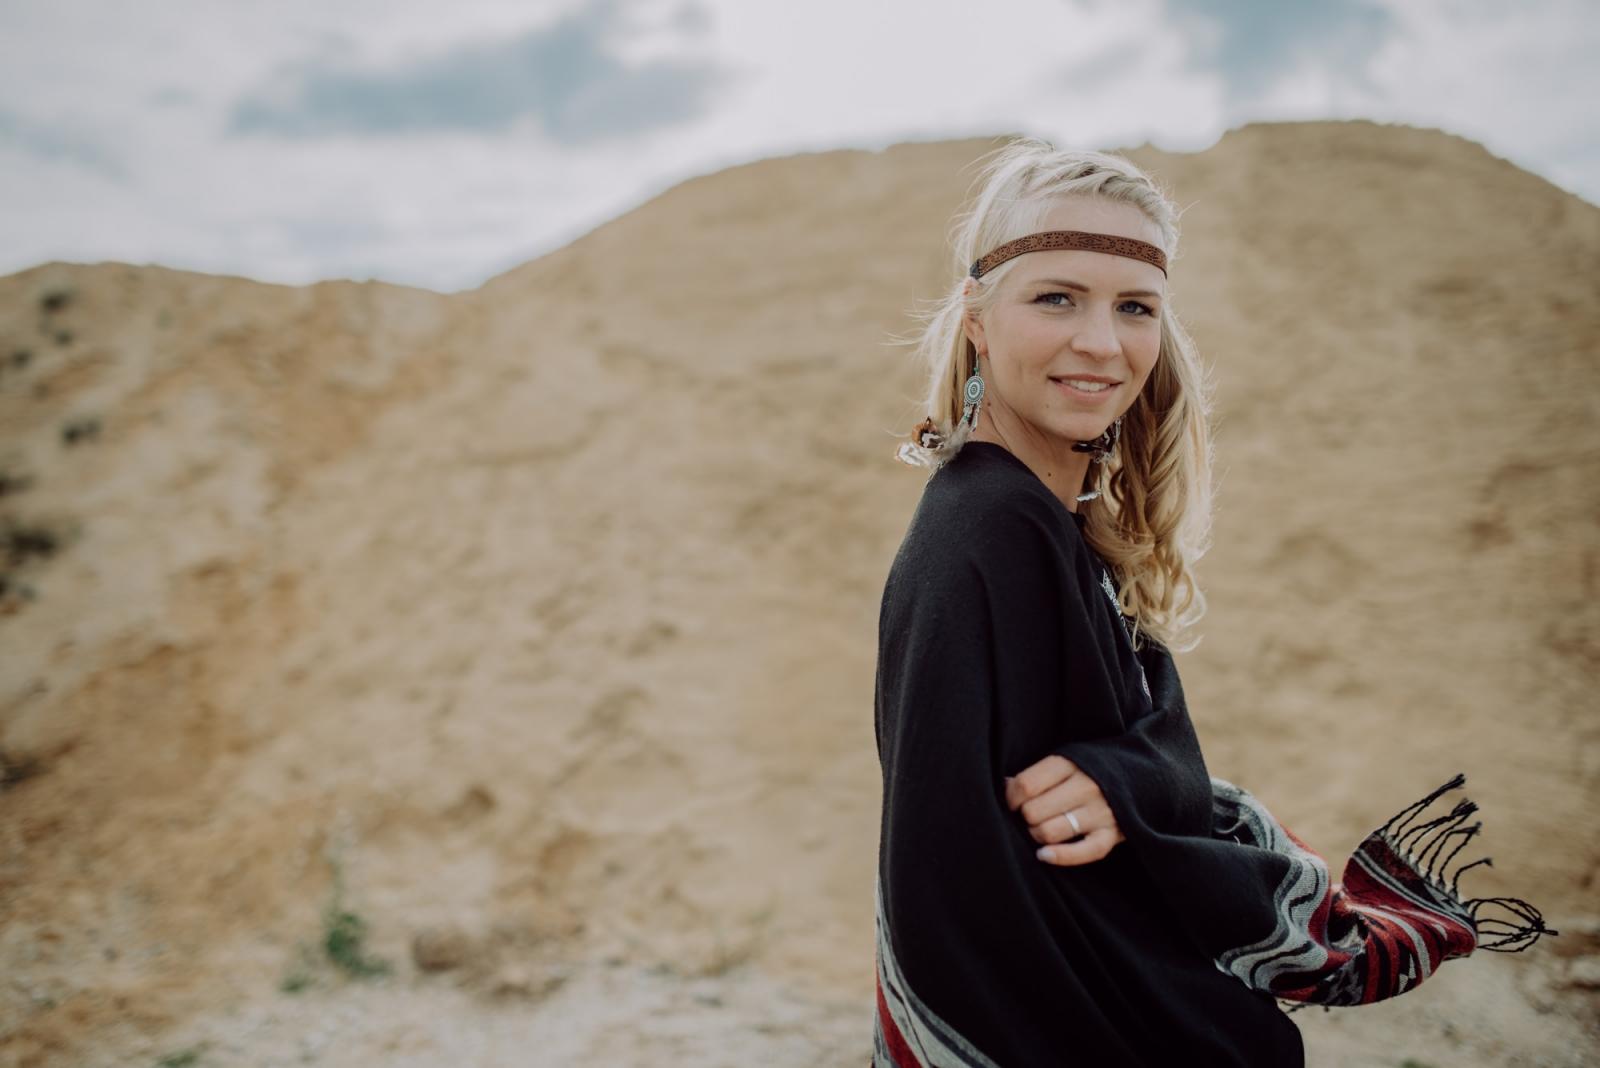 Boho Fotoshooting mit blondem Model in der Kiegrube